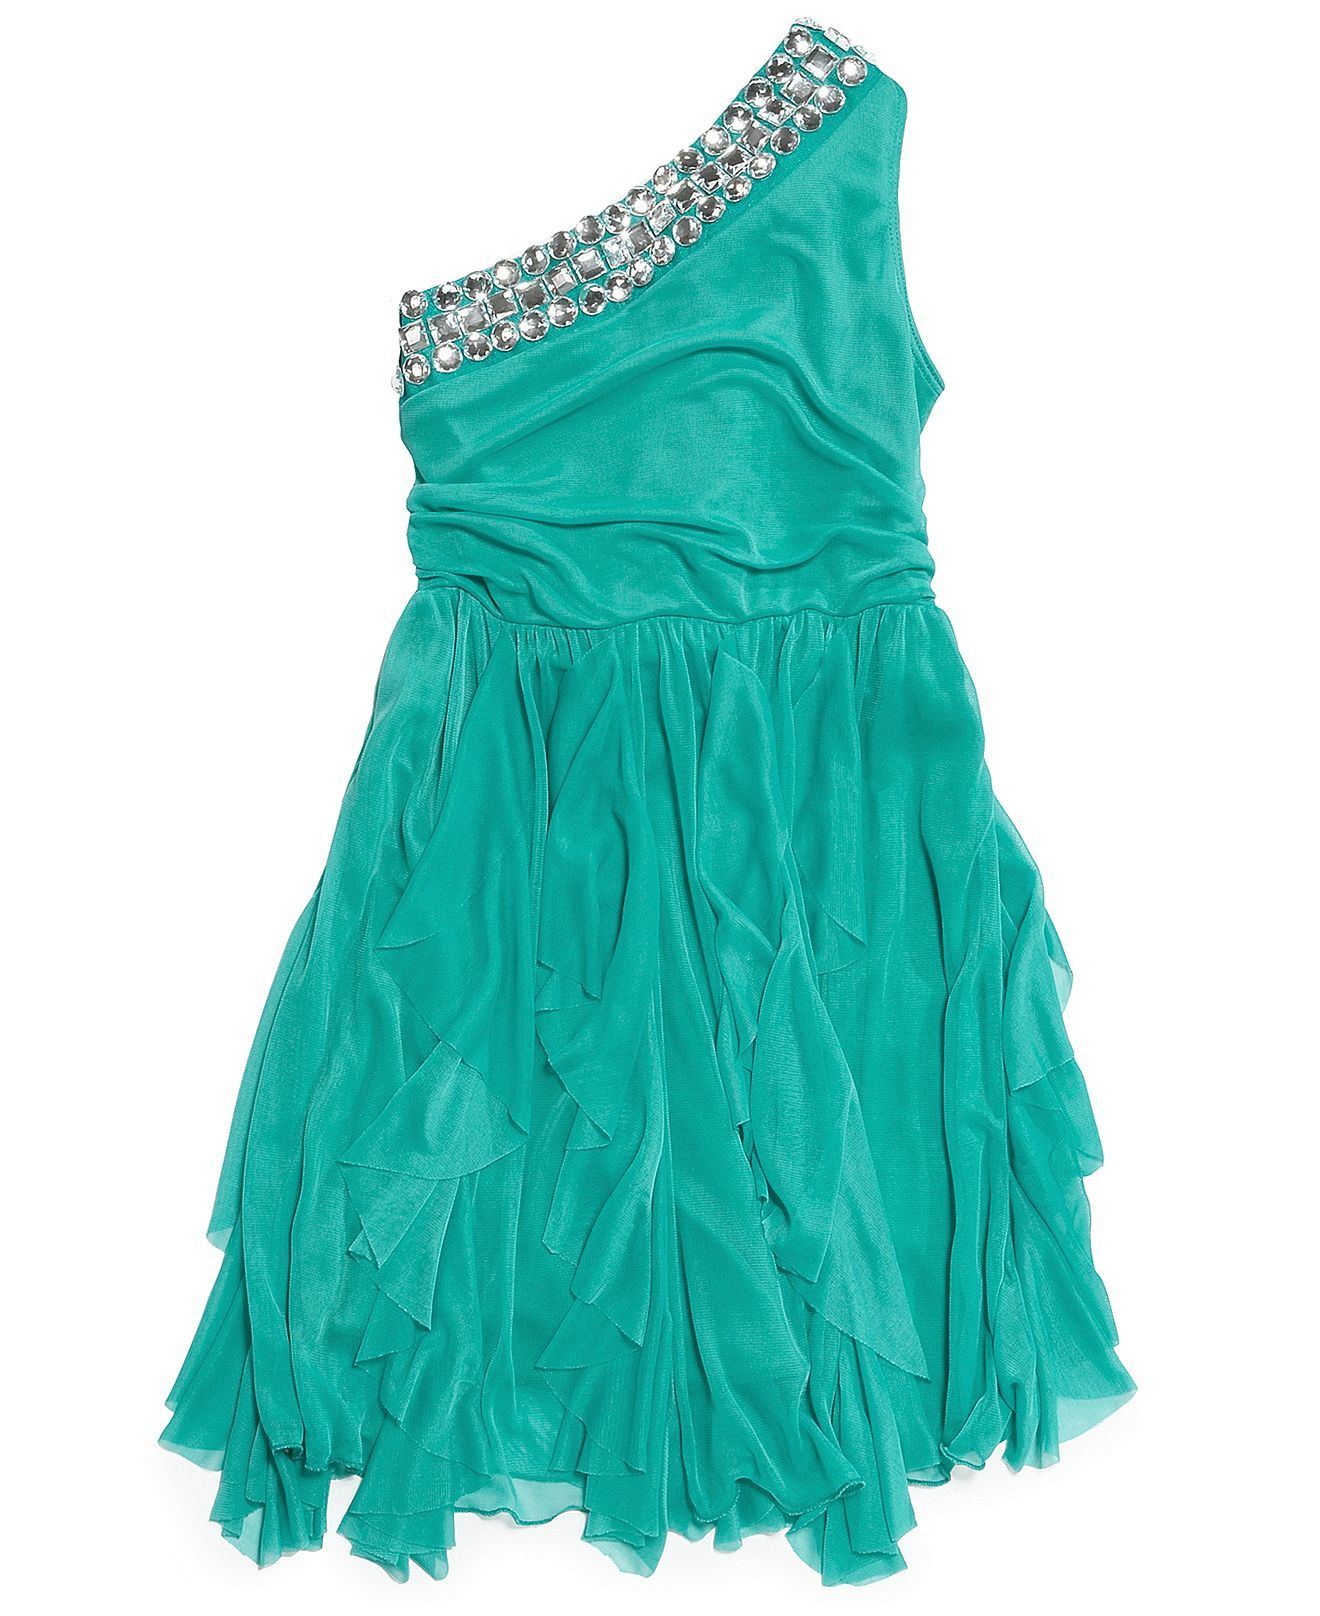 Ruby Rox Girls e Shoulder Dress Kids Girls 7 16 Macy s